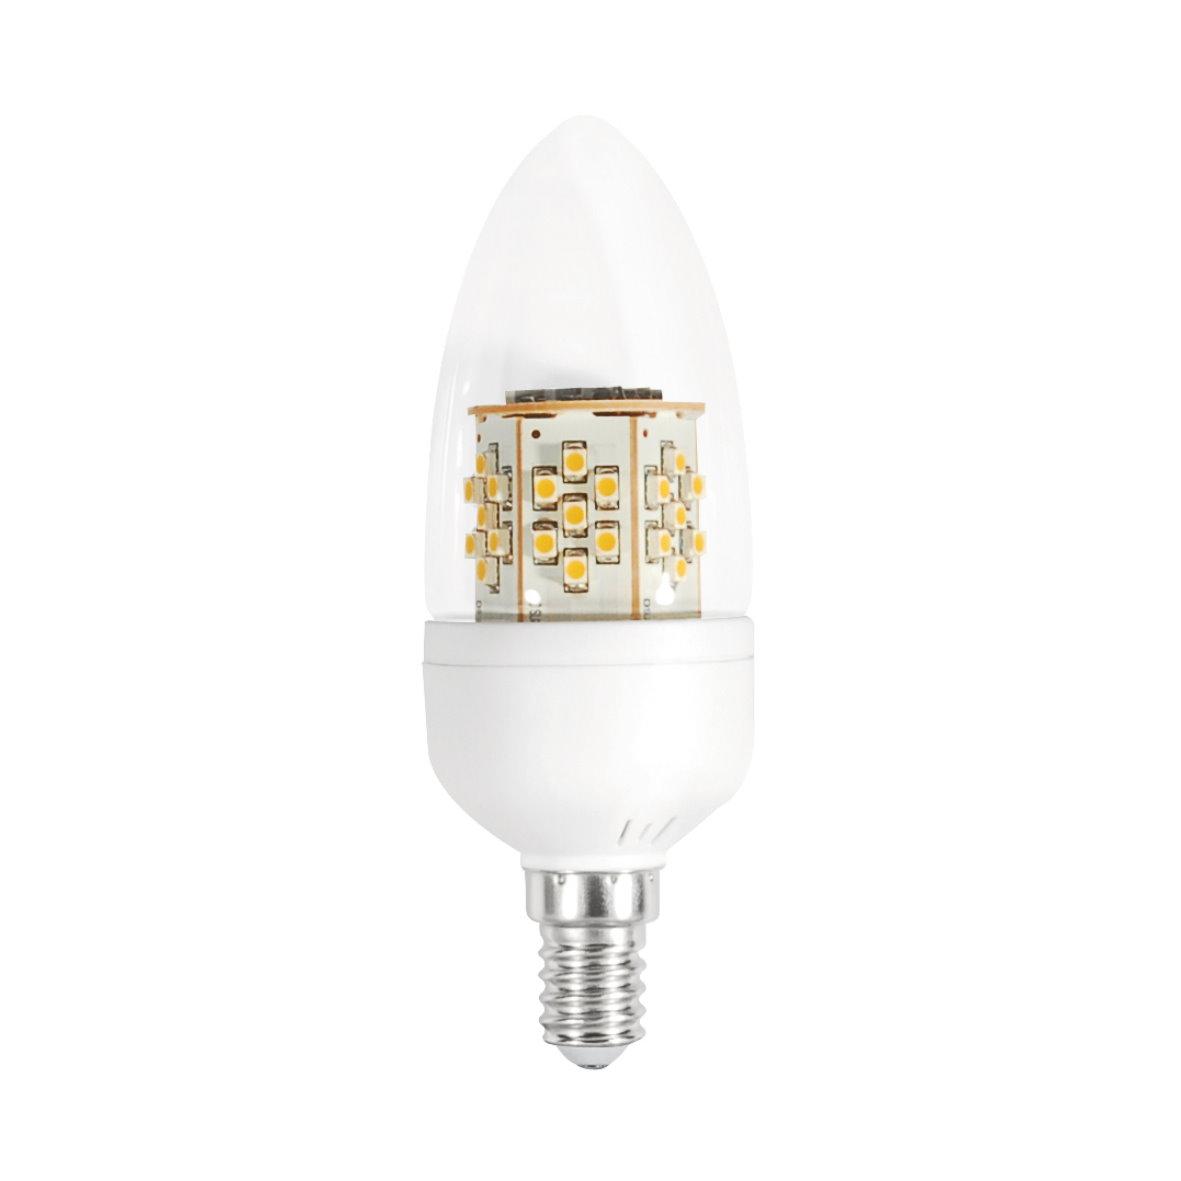 smd del 360 b ton ampoules ma s piston ampoule rgb verre. Black Bedroom Furniture Sets. Home Design Ideas